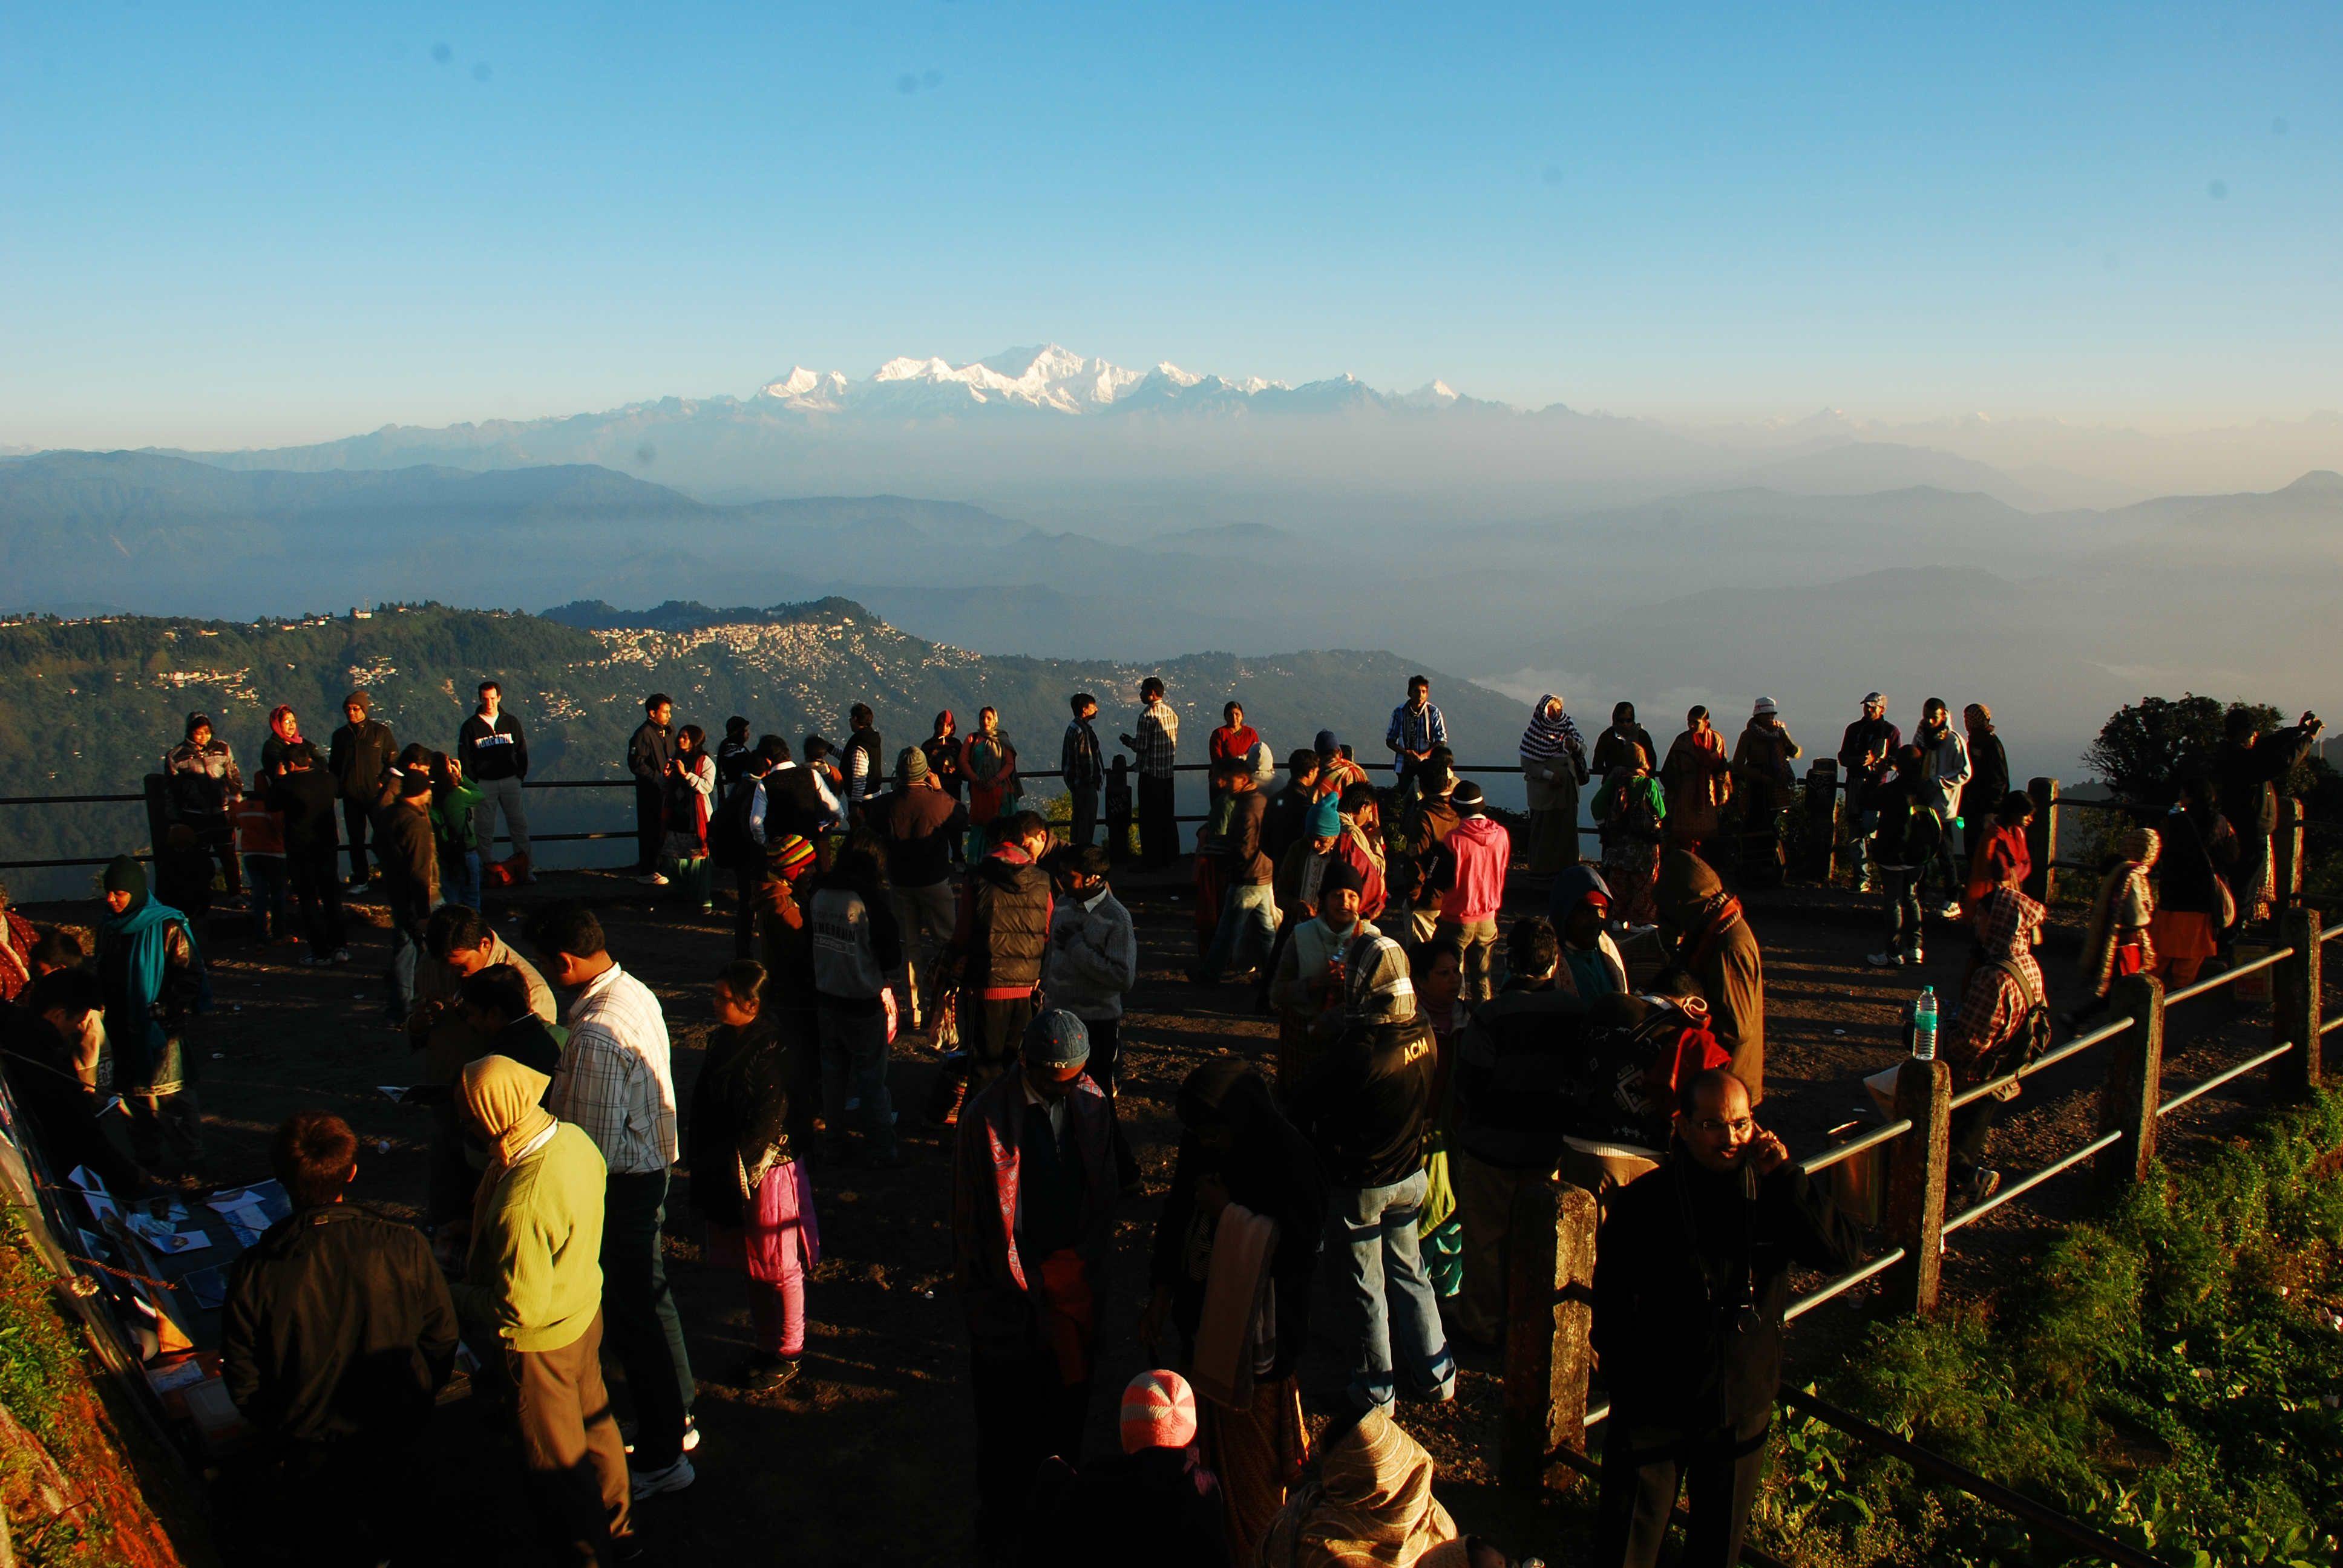 Tourists At Tiger Hill In Darjeeling Tour Packages Gangtok Darjeeling